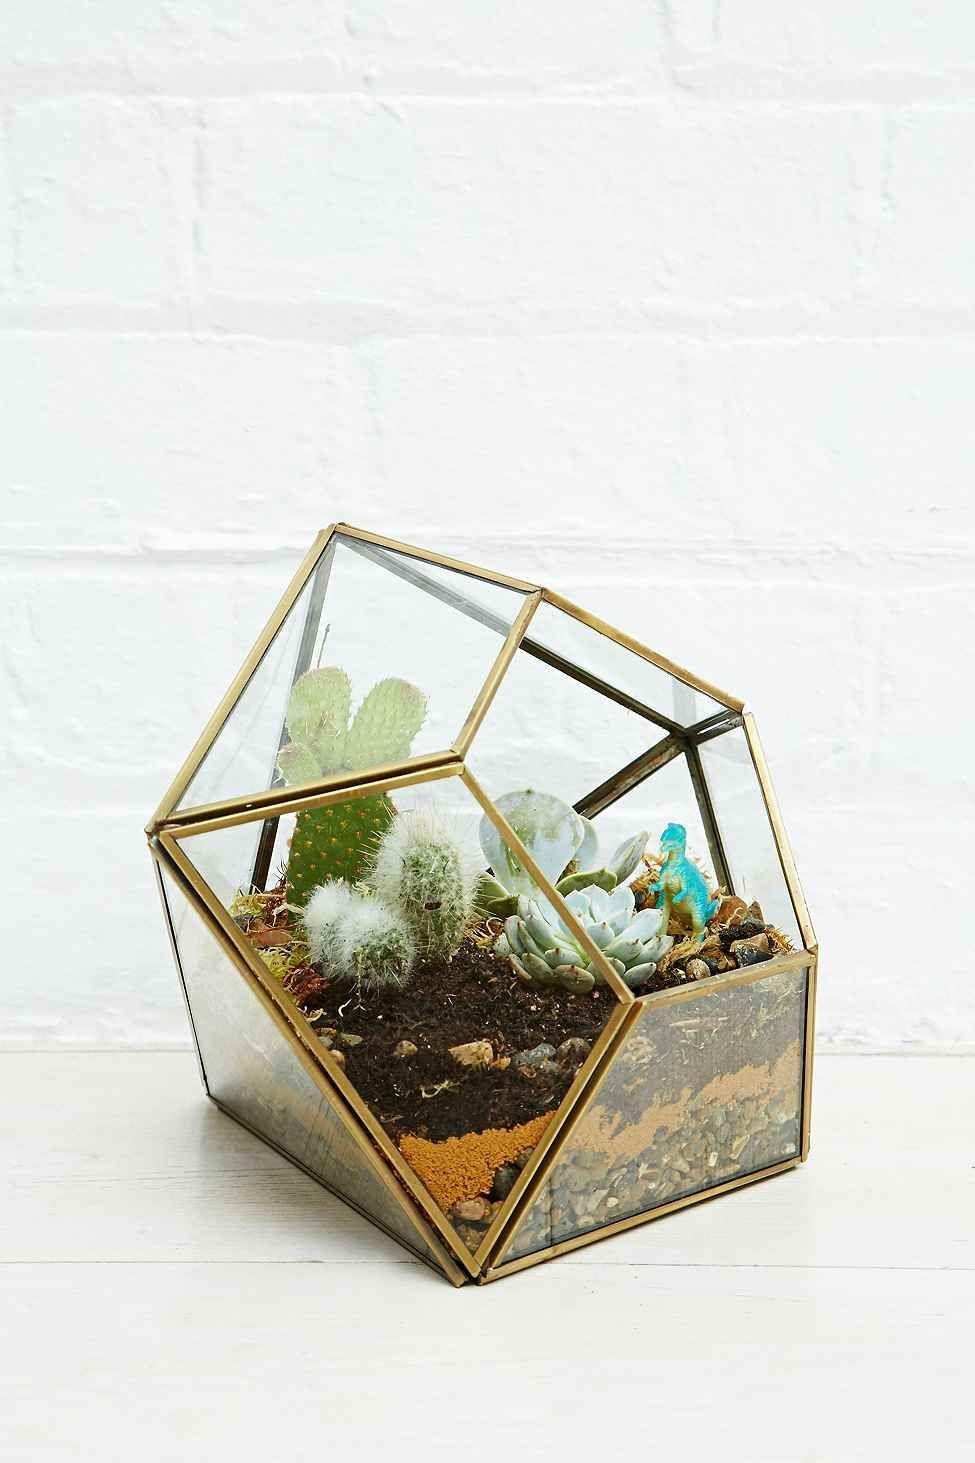 urban grow diamantenf rmiger terrarium blumentopf in gold. Black Bedroom Furniture Sets. Home Design Ideas